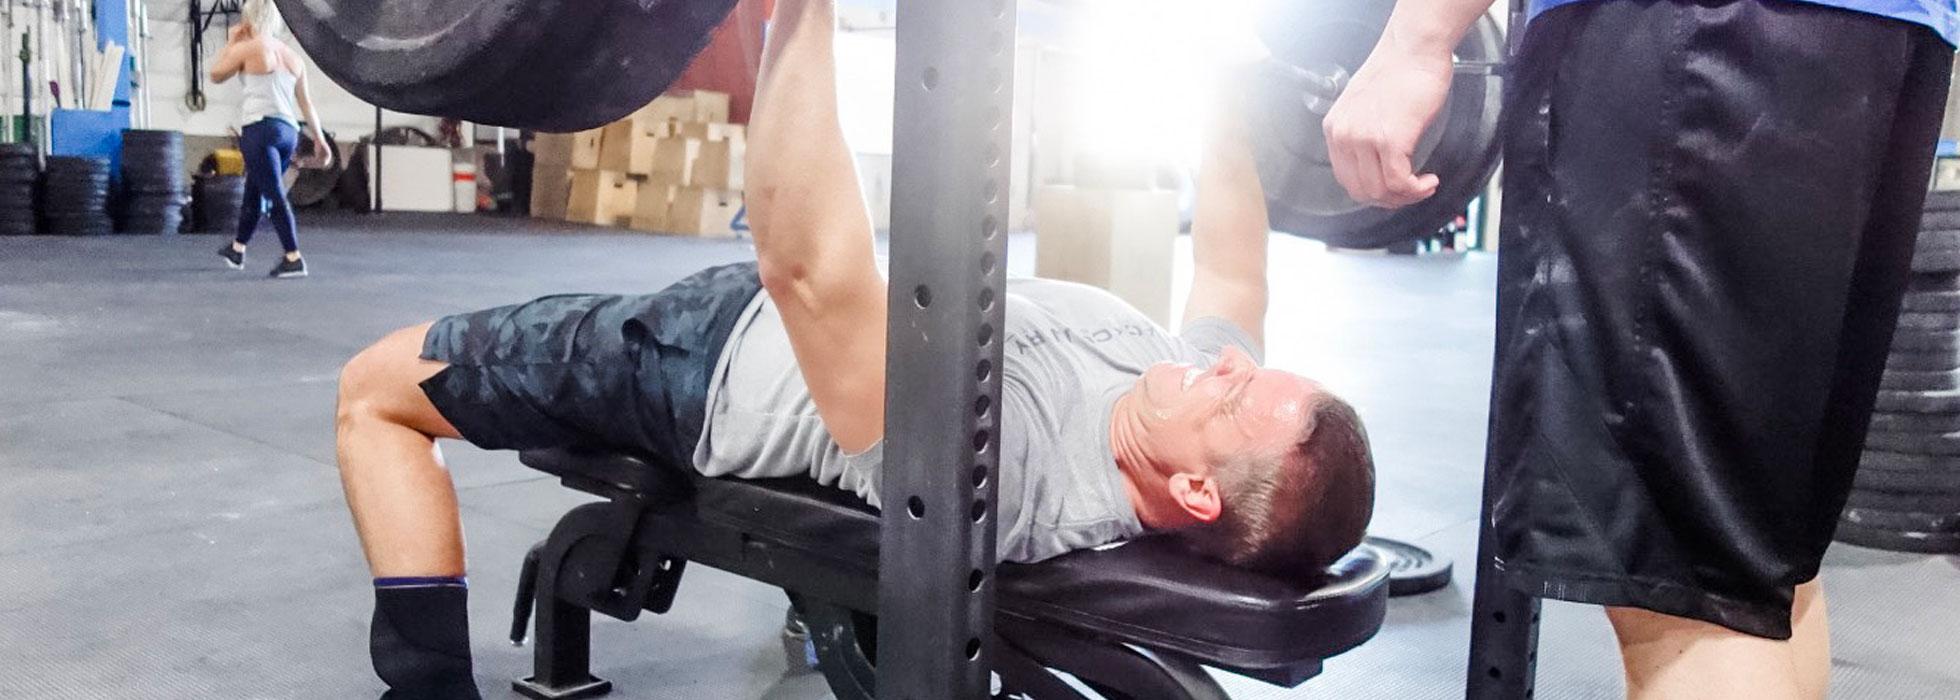 Weightlifting Training near Highlands Ranch CO, Weightlifting Training near Denver CO, Weightlifting Training near Littleton CO